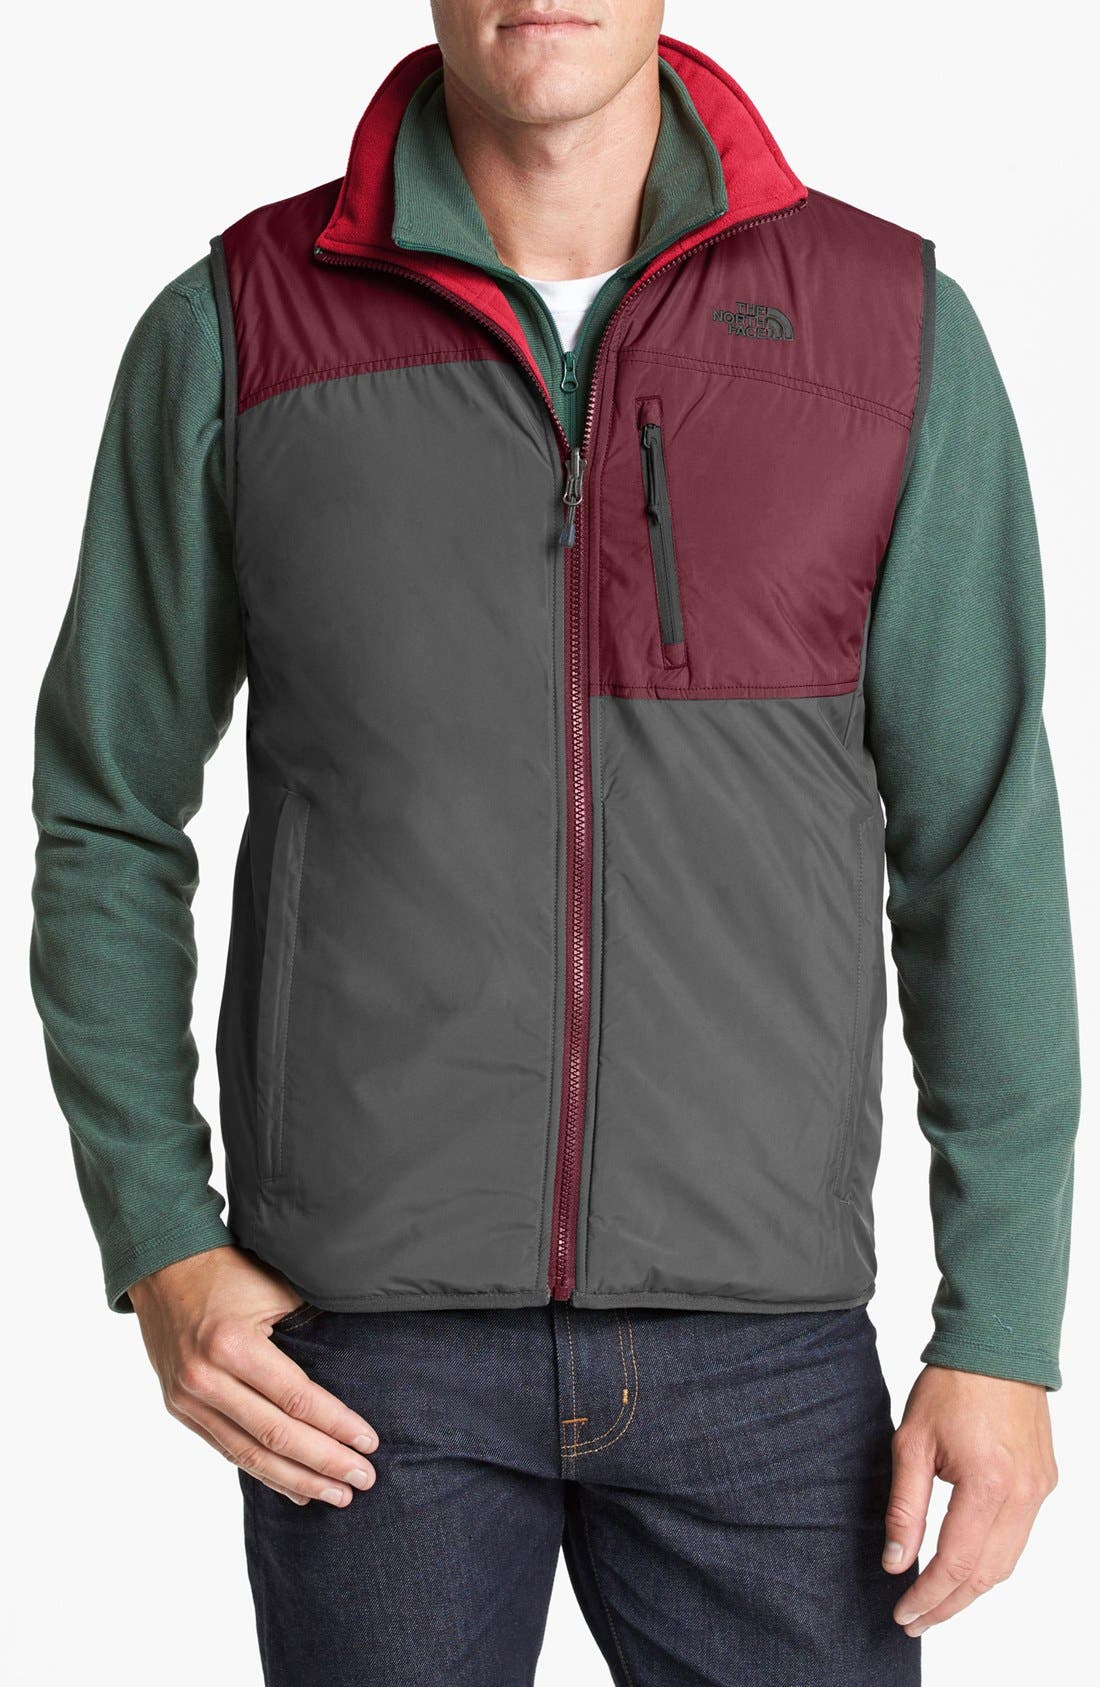 Main Image - The North Face 'TKA Trinity' Reversible Vest